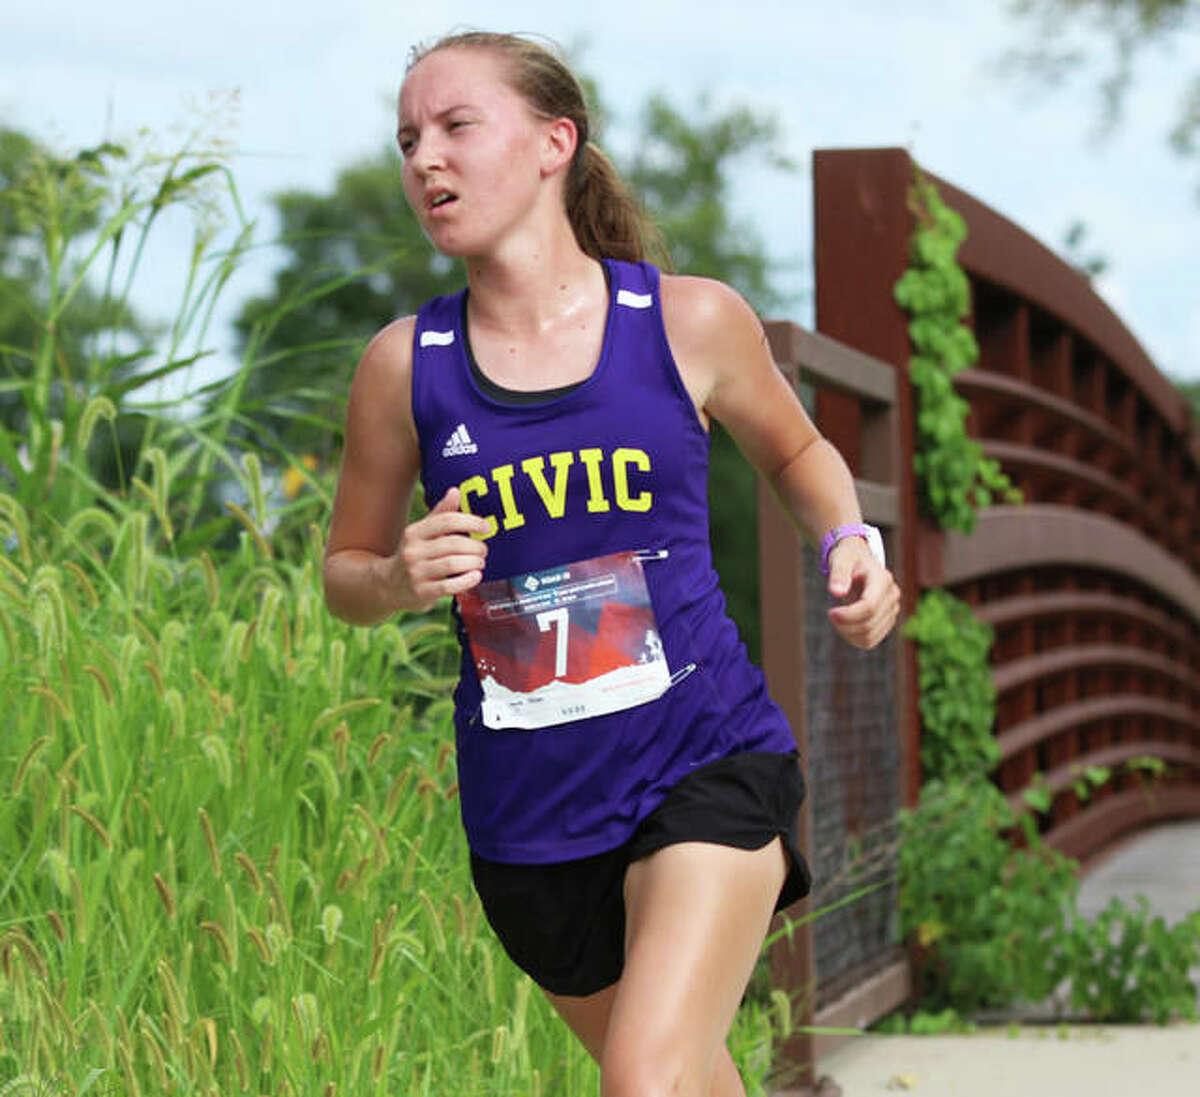 CM sophomore Hannah Meiser runs at the Bethalto Sports Complex, where she won the girls race Aug. 26 in a dual meet with Roxana.